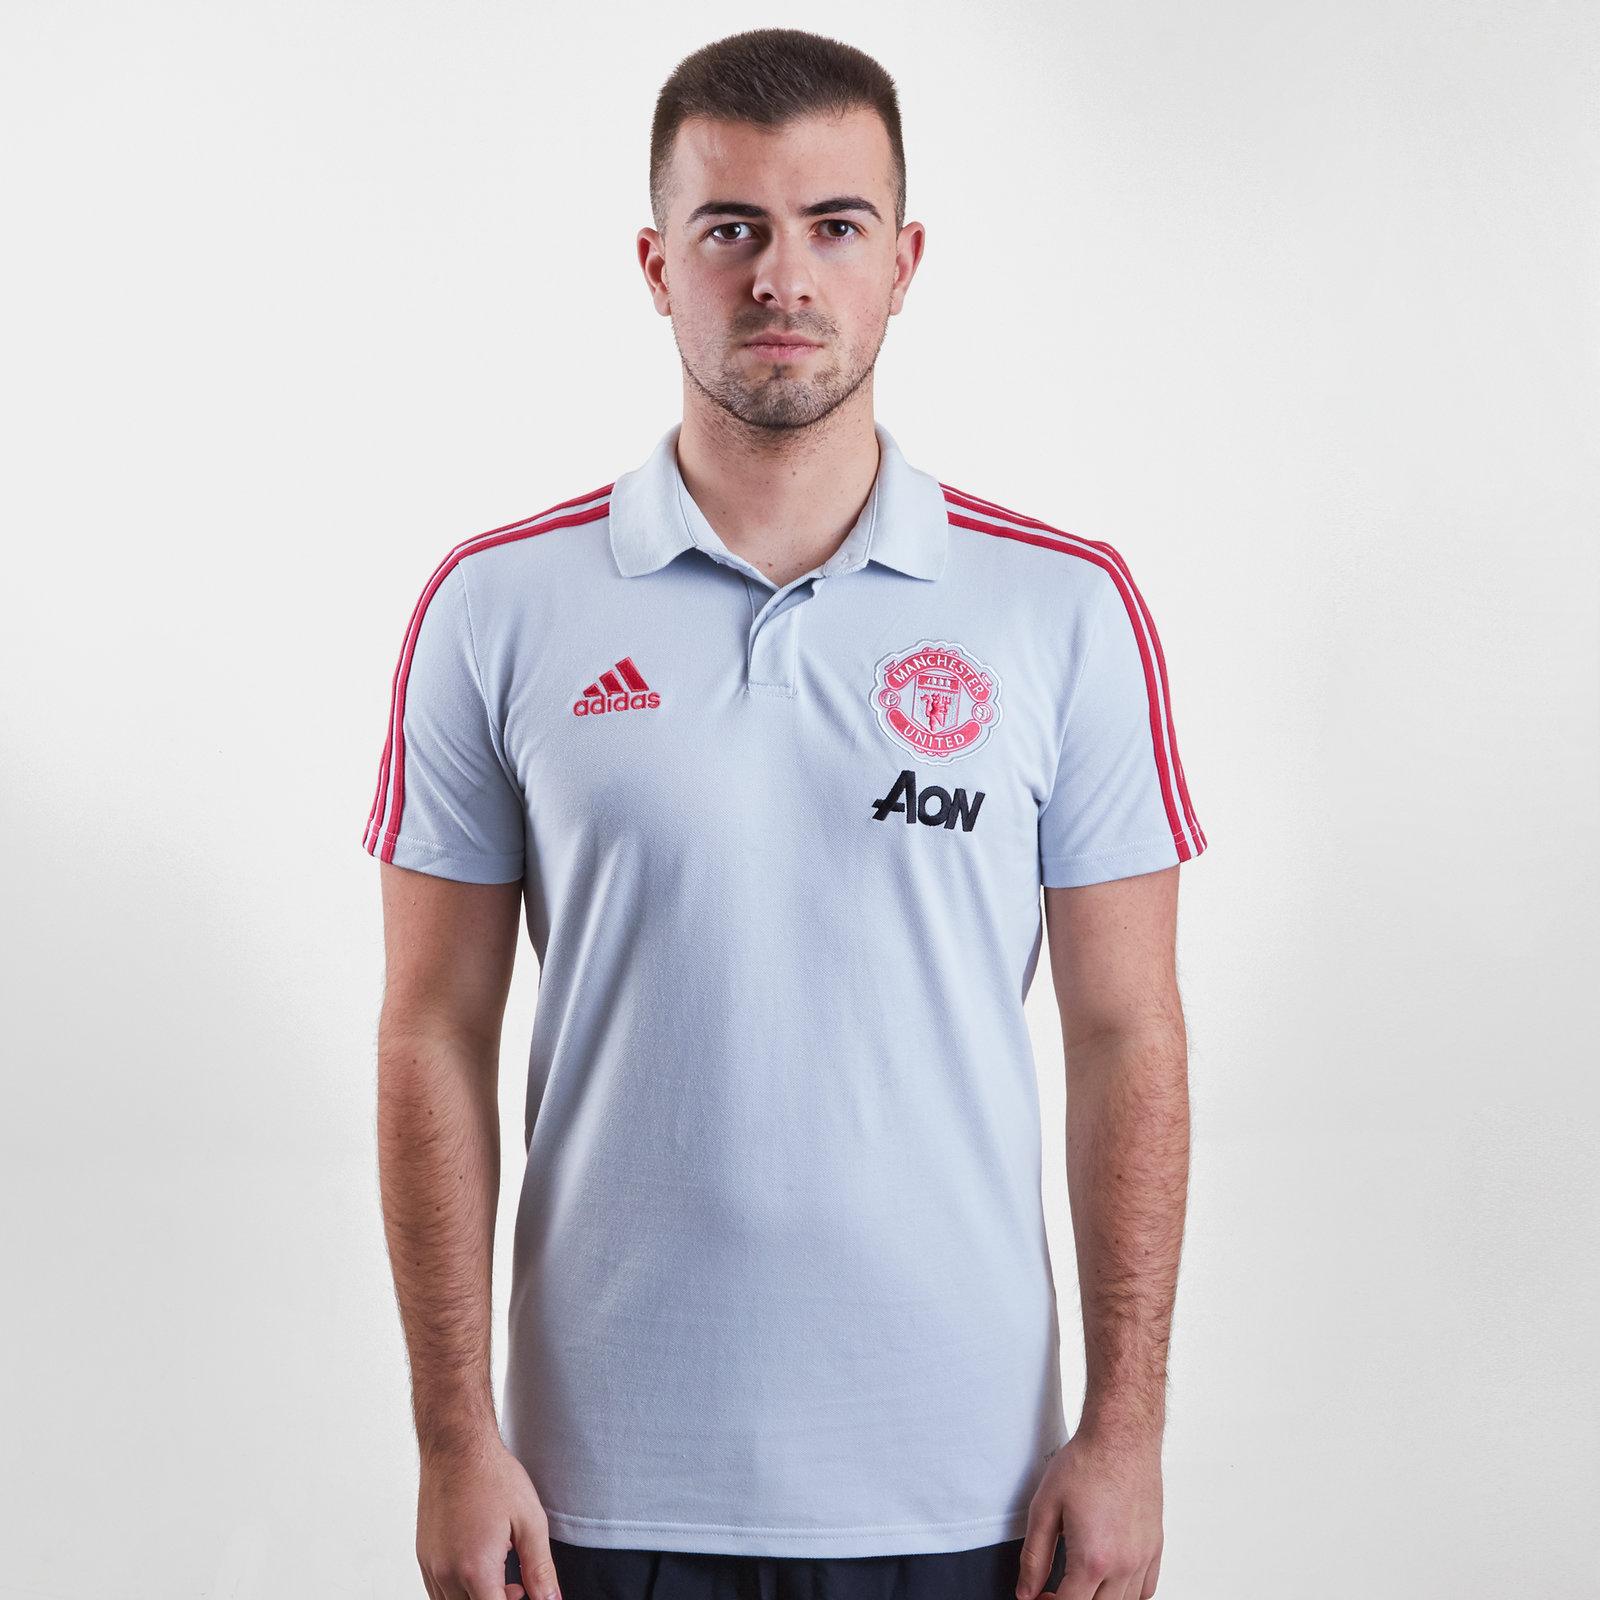 Manchester United Polo Shirt Adidas 71b02a